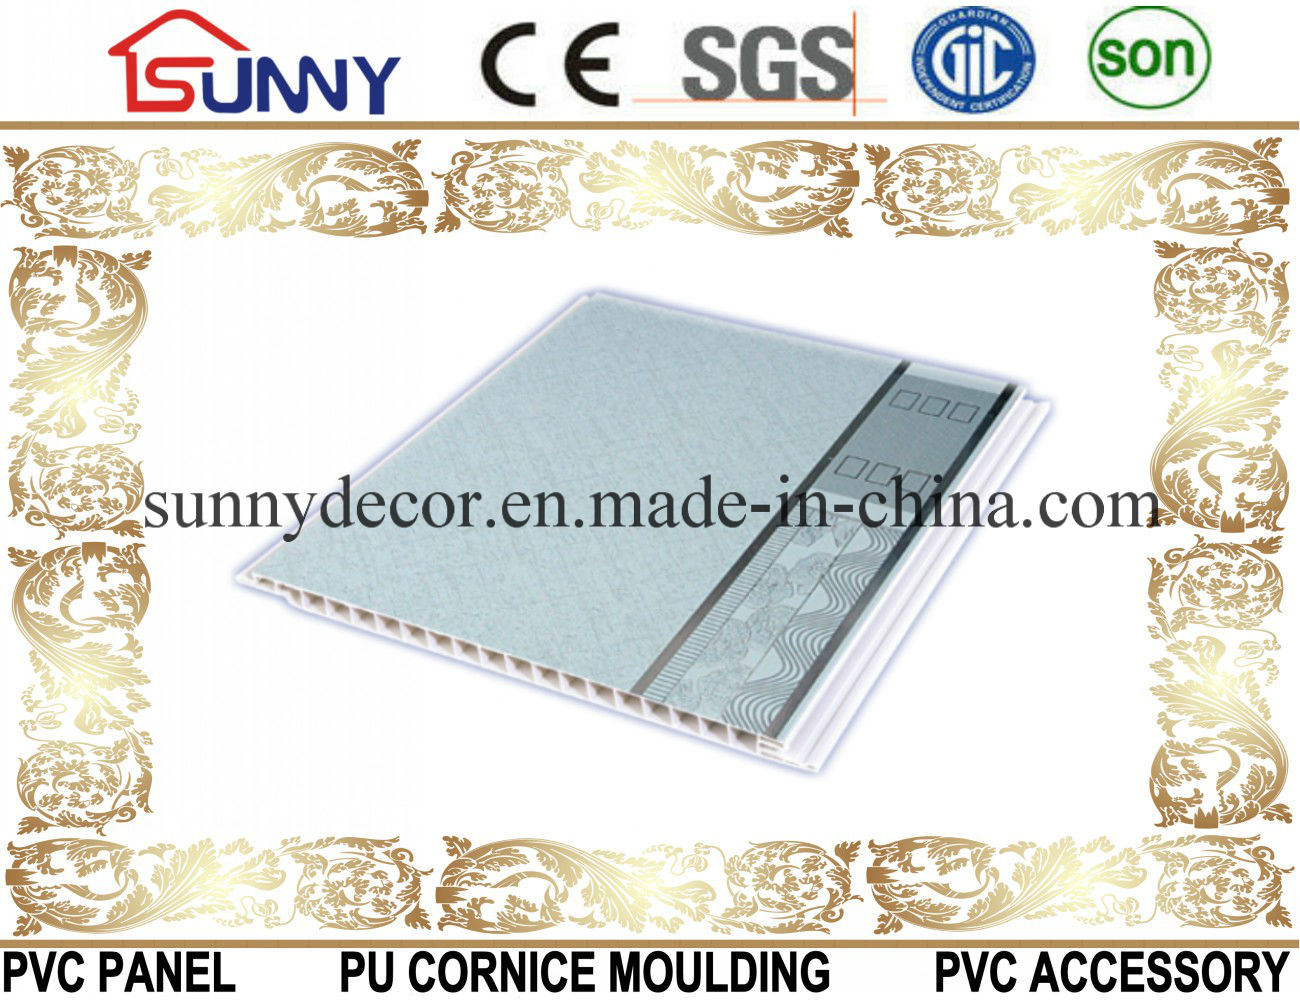 PVC Panel-PVC-Ceiling-PVC Wall Panel-PVC Printing Panel for Decoration